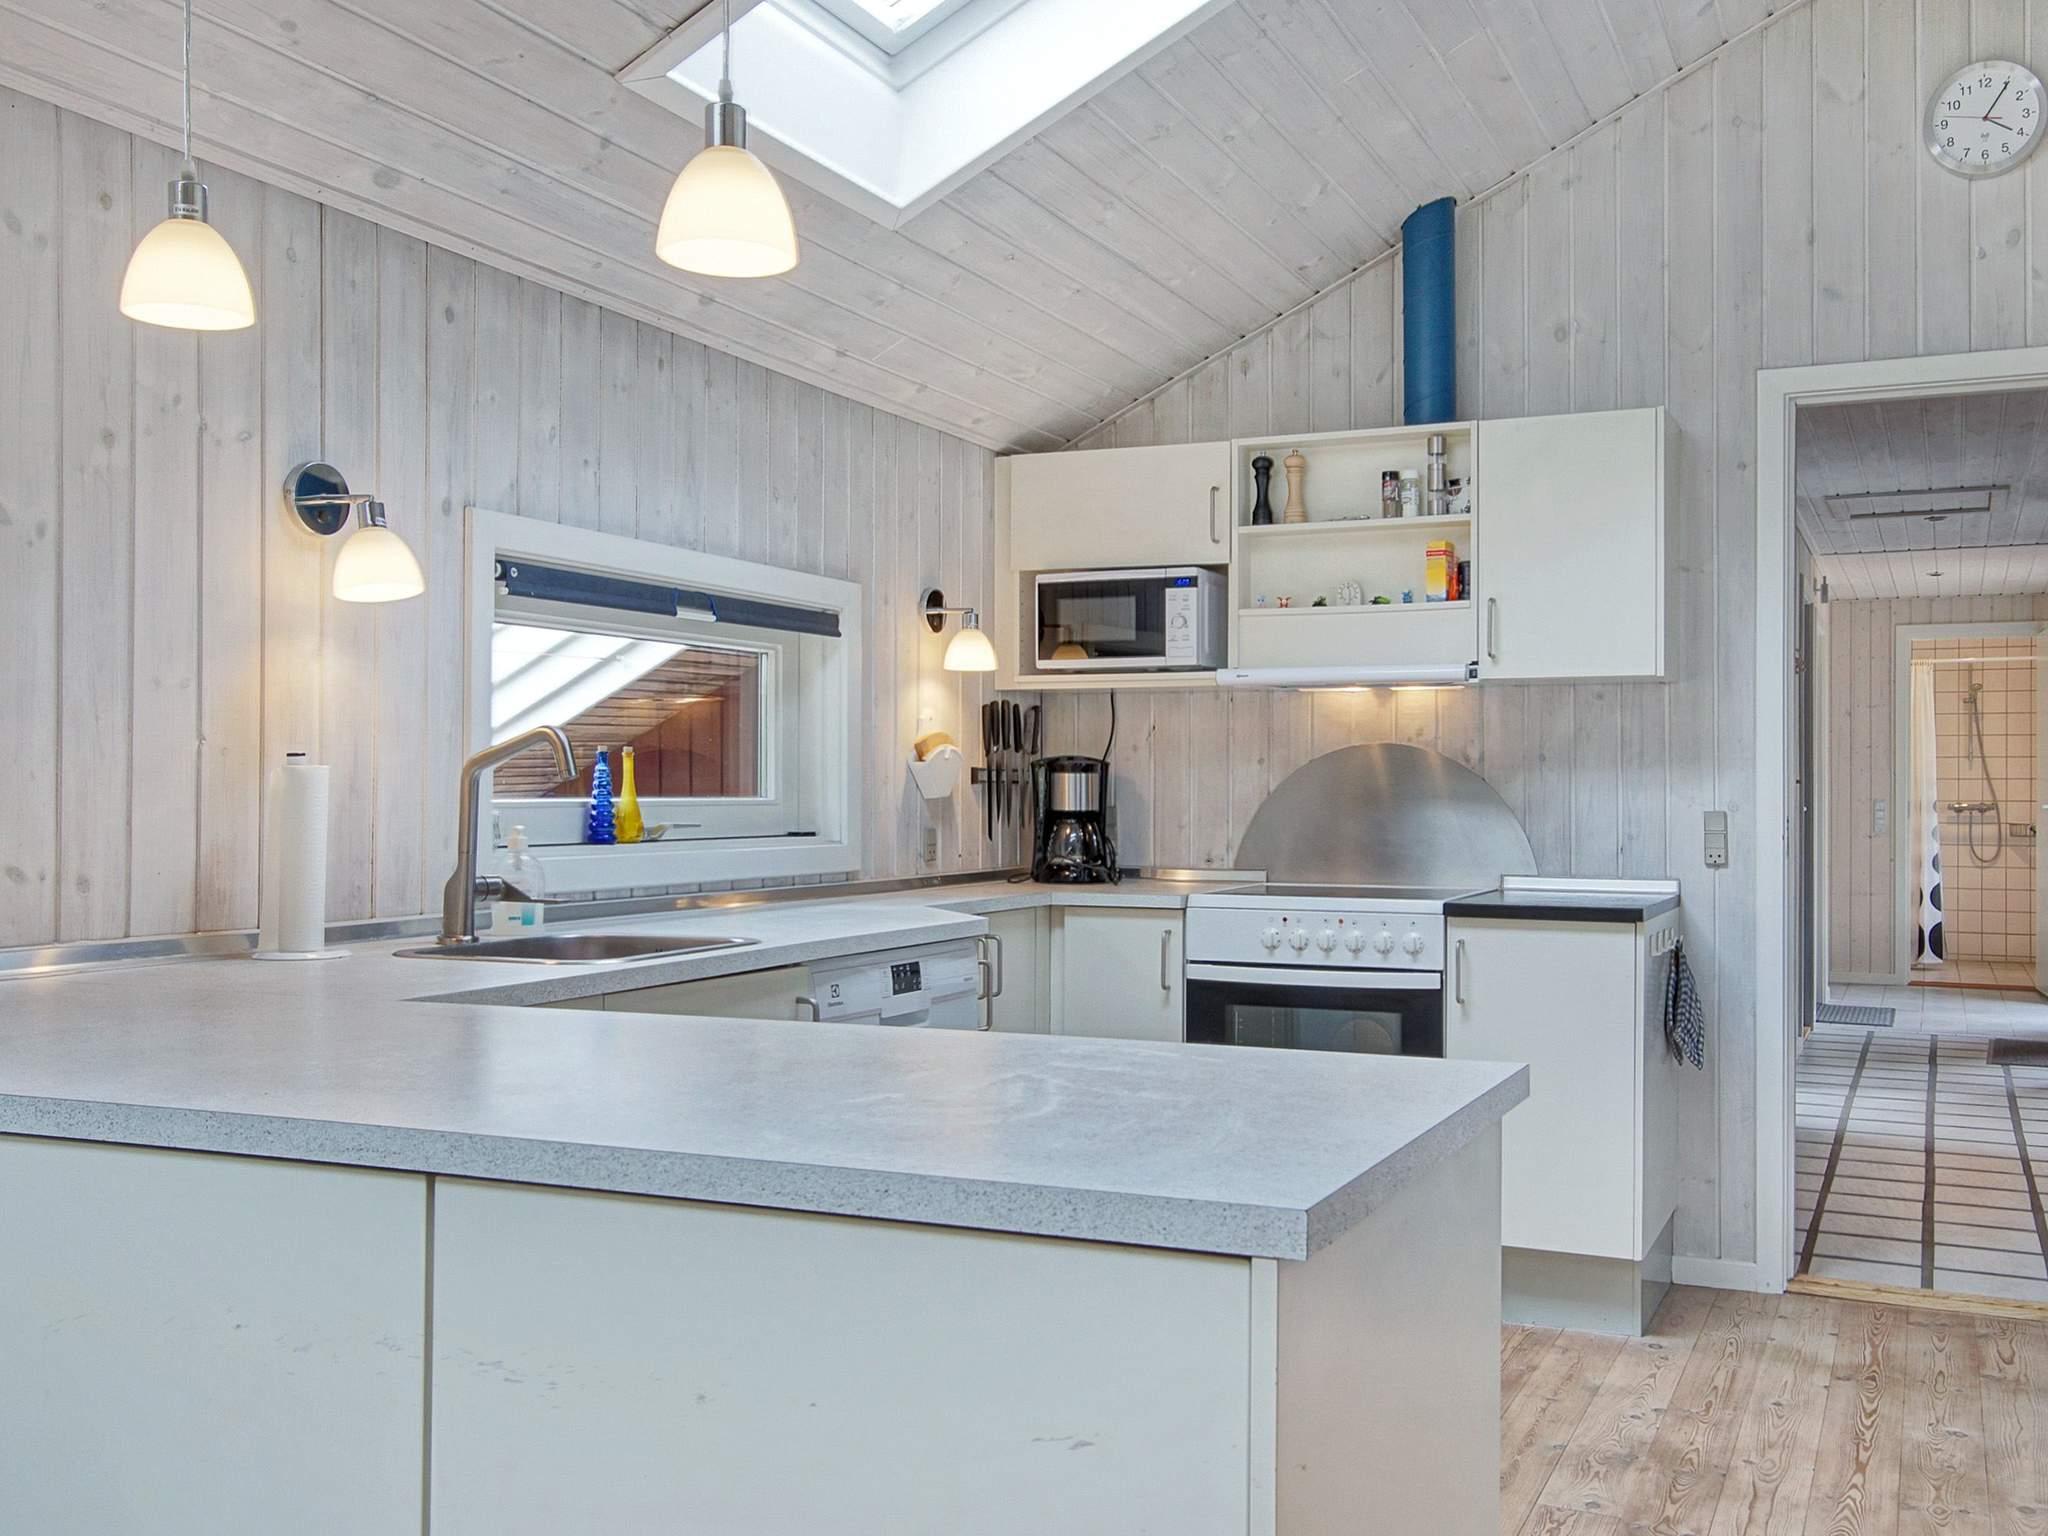 Ferienhaus Sommerodde (82550), Nexø, , Bornholm, Dänemark, Bild 4